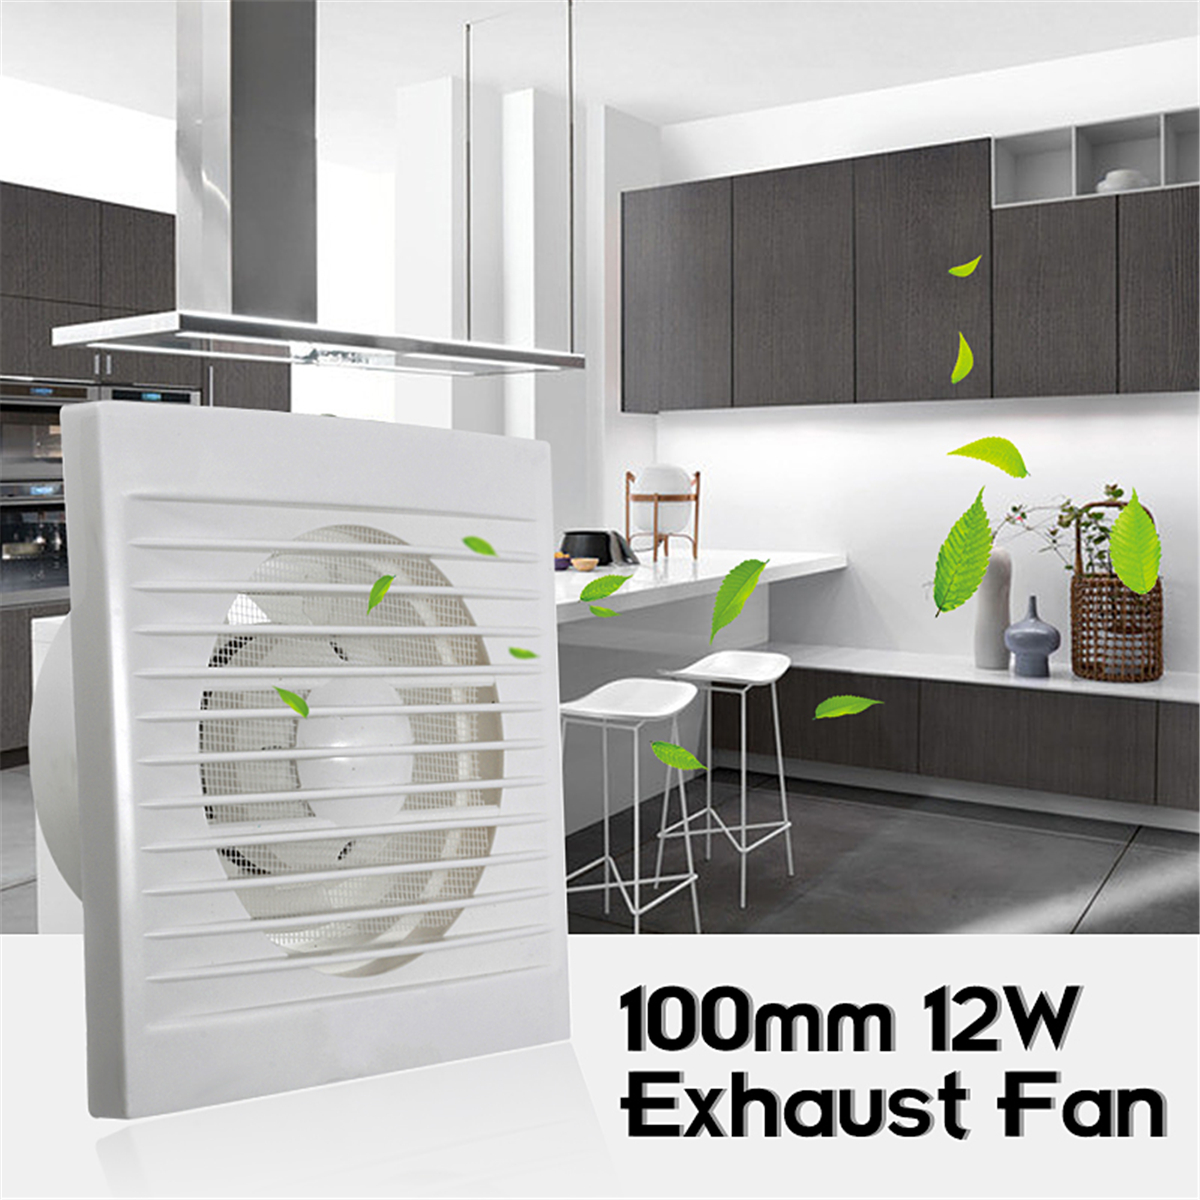 6 inch window wall mounted ventilation